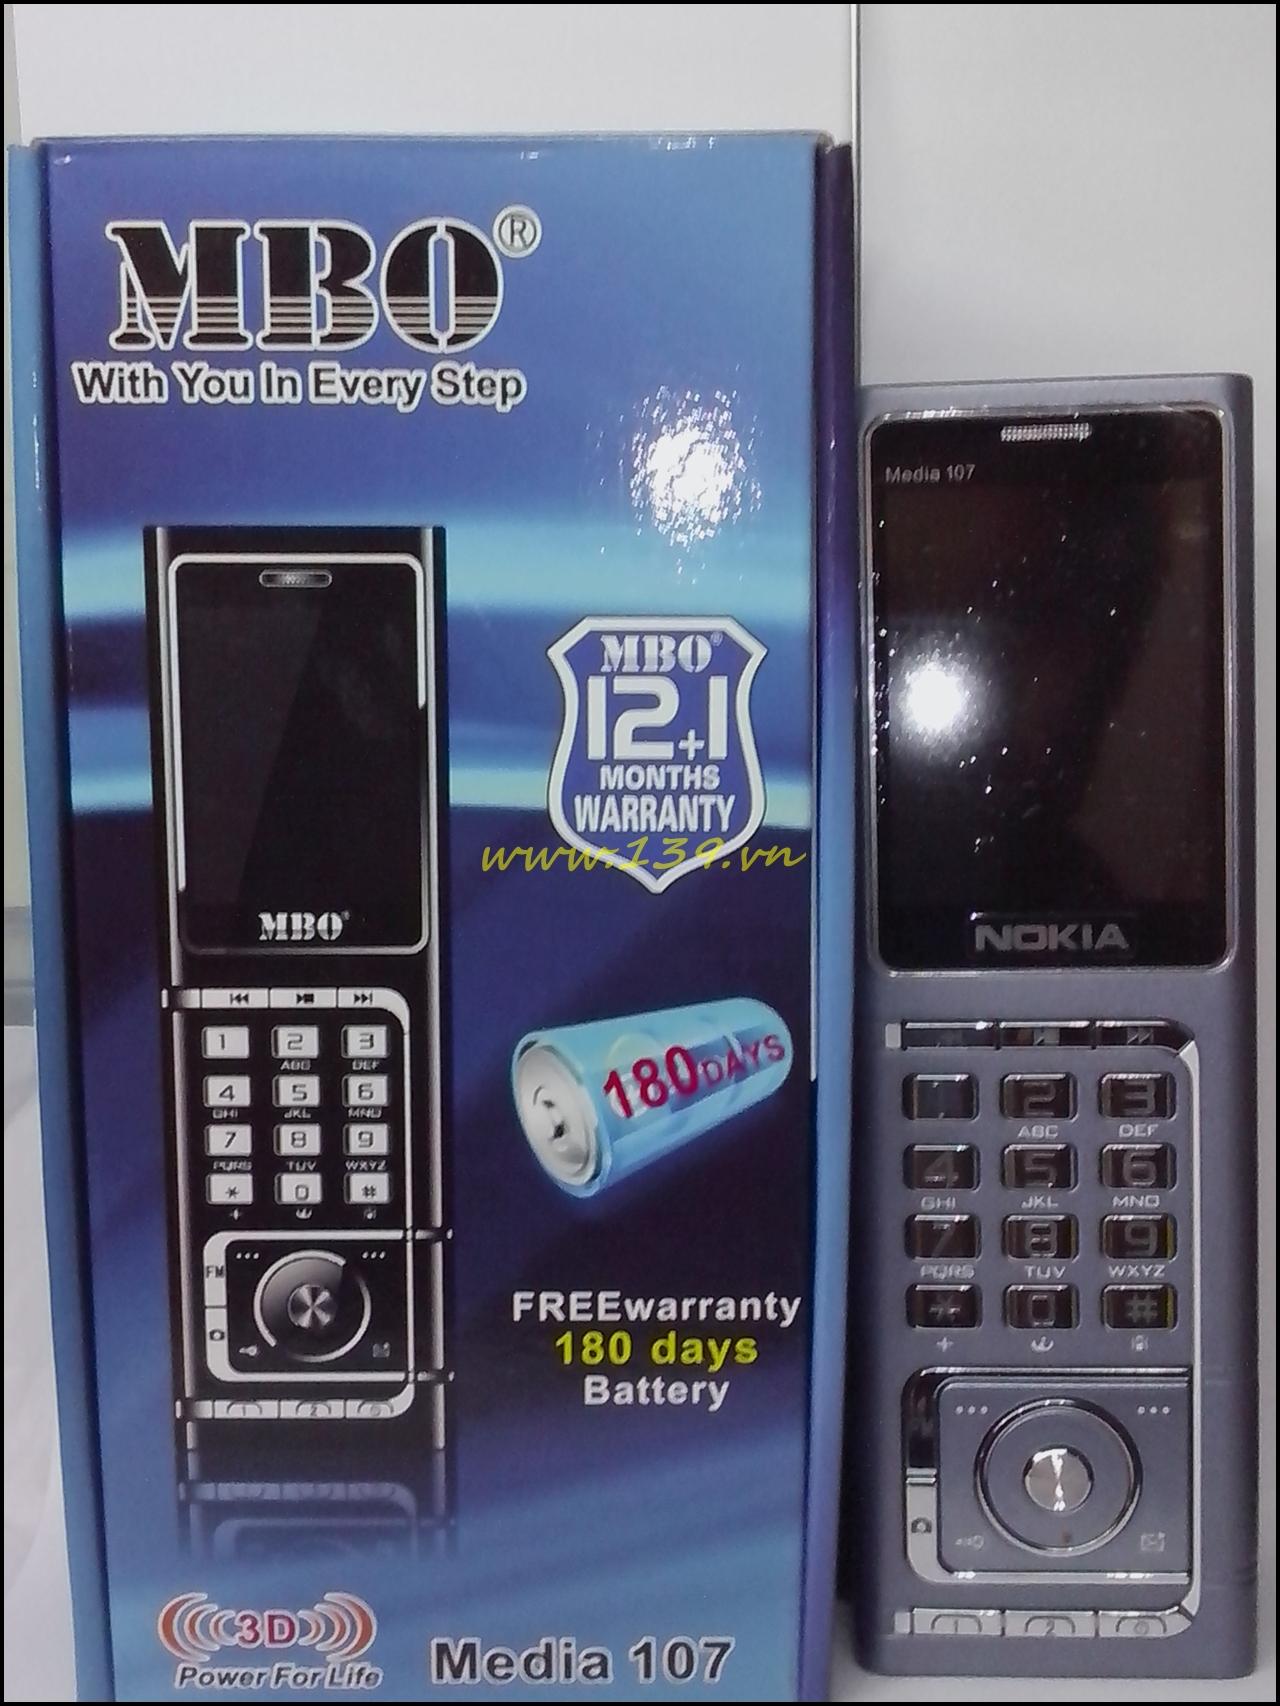 Nokia media 107